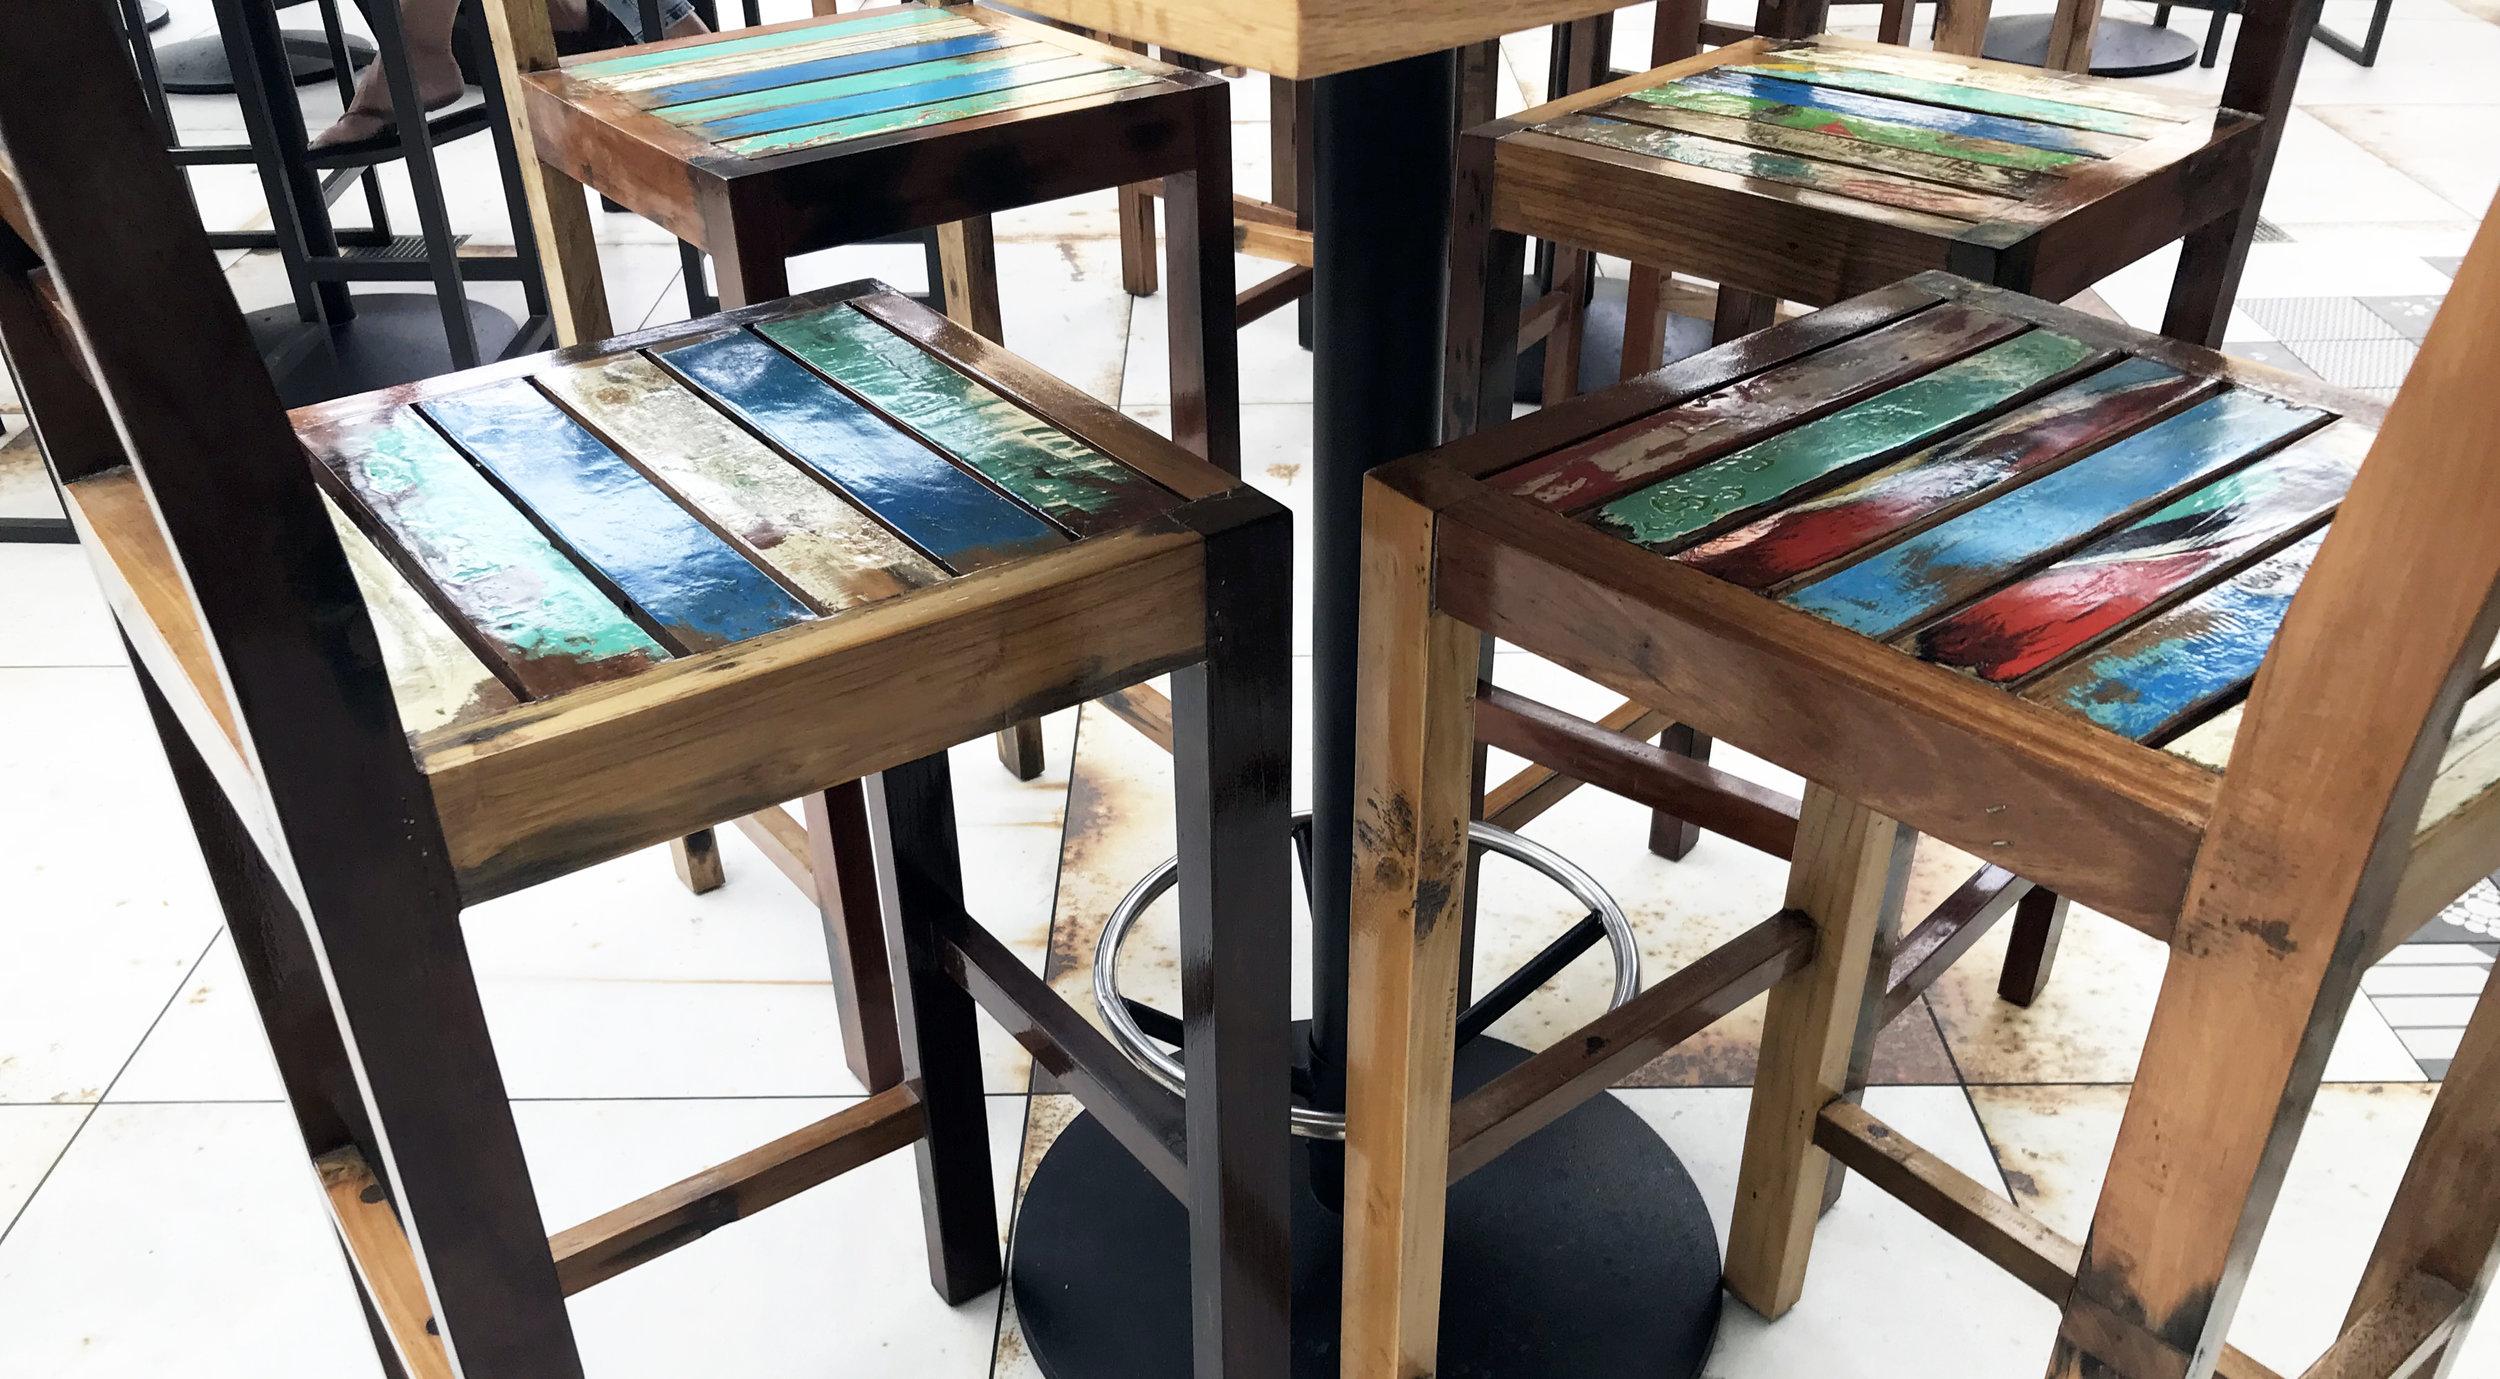 Casabarcelona_Chairs.jpg